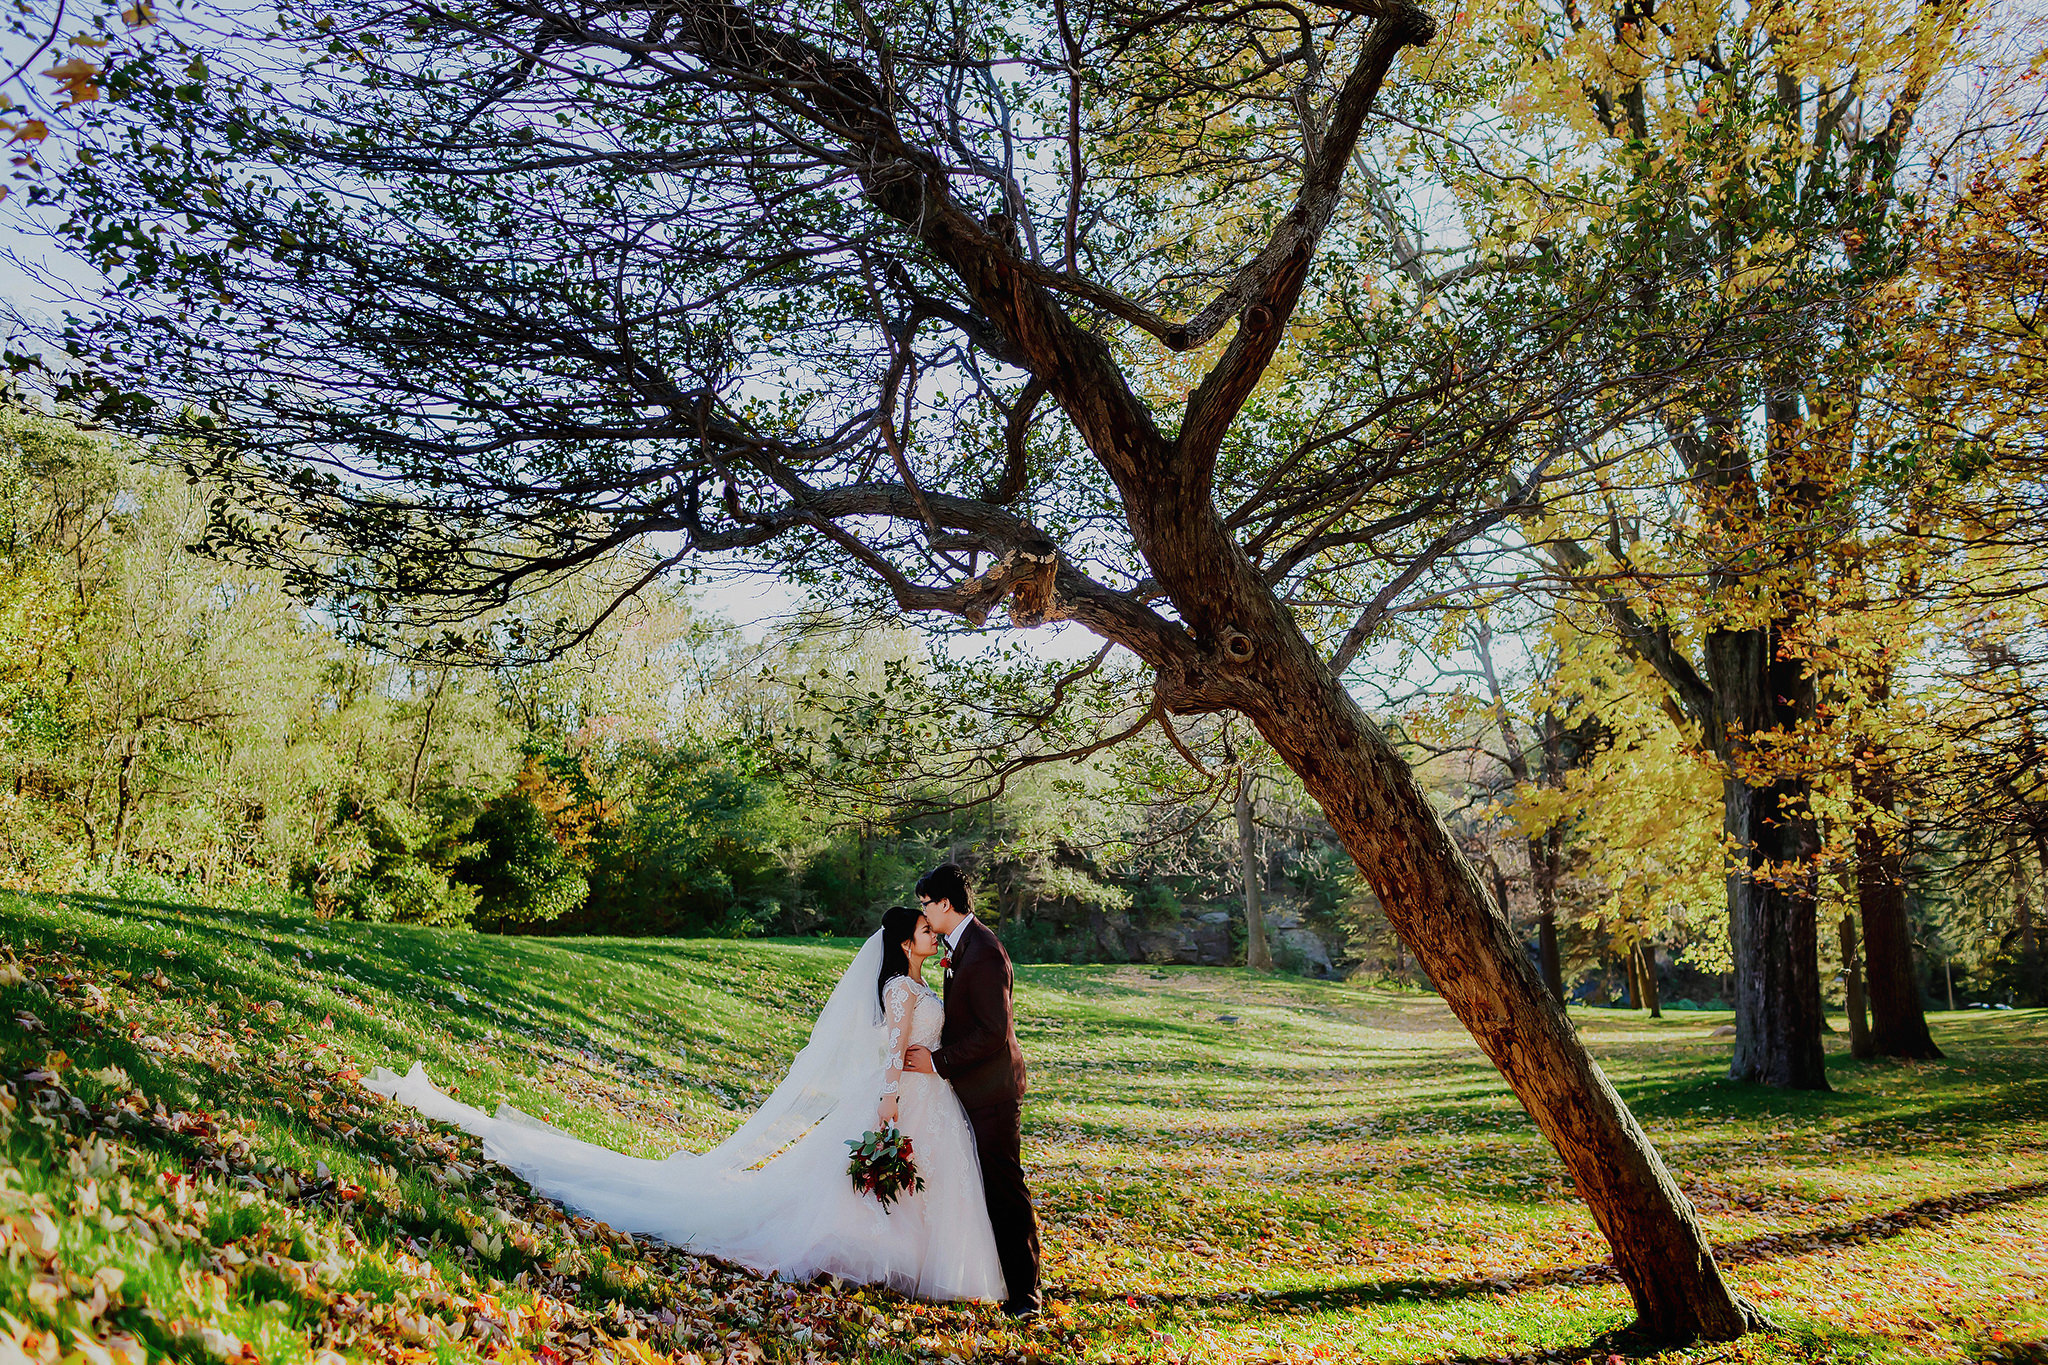 Wedding portrait by unusual tree in Montreal park